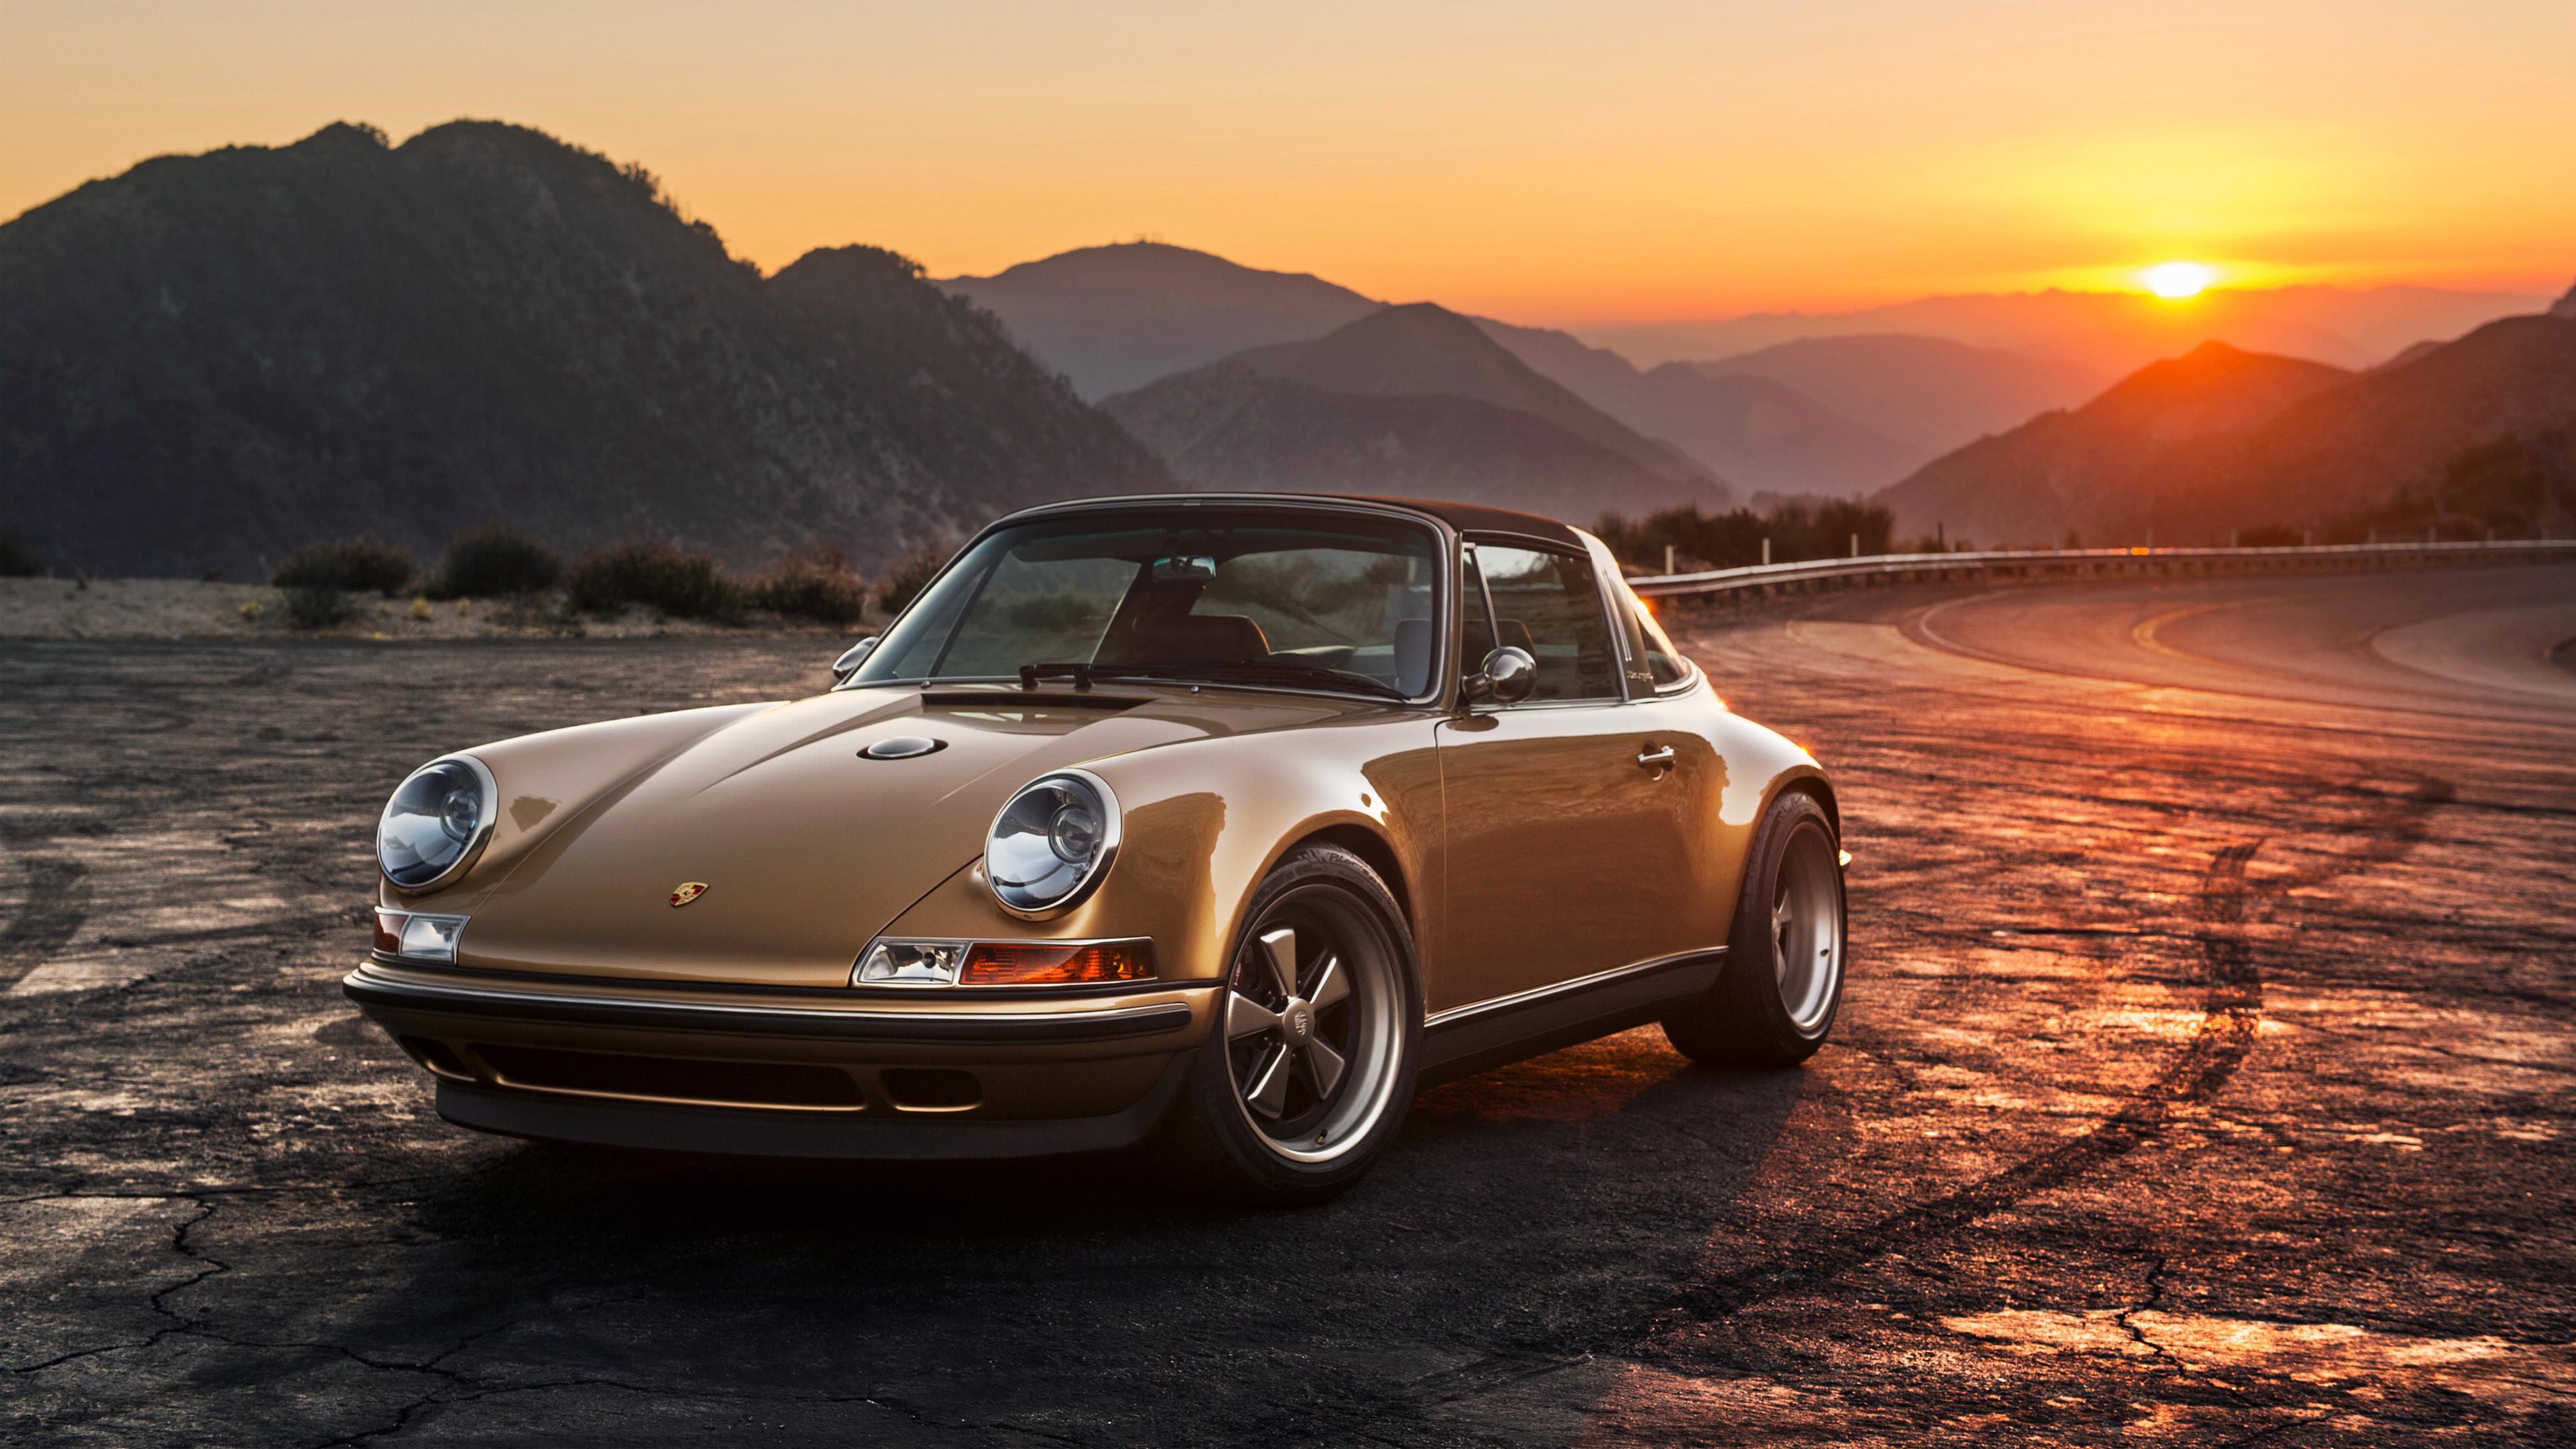 Singer Porsche Wallpaper 70 Images